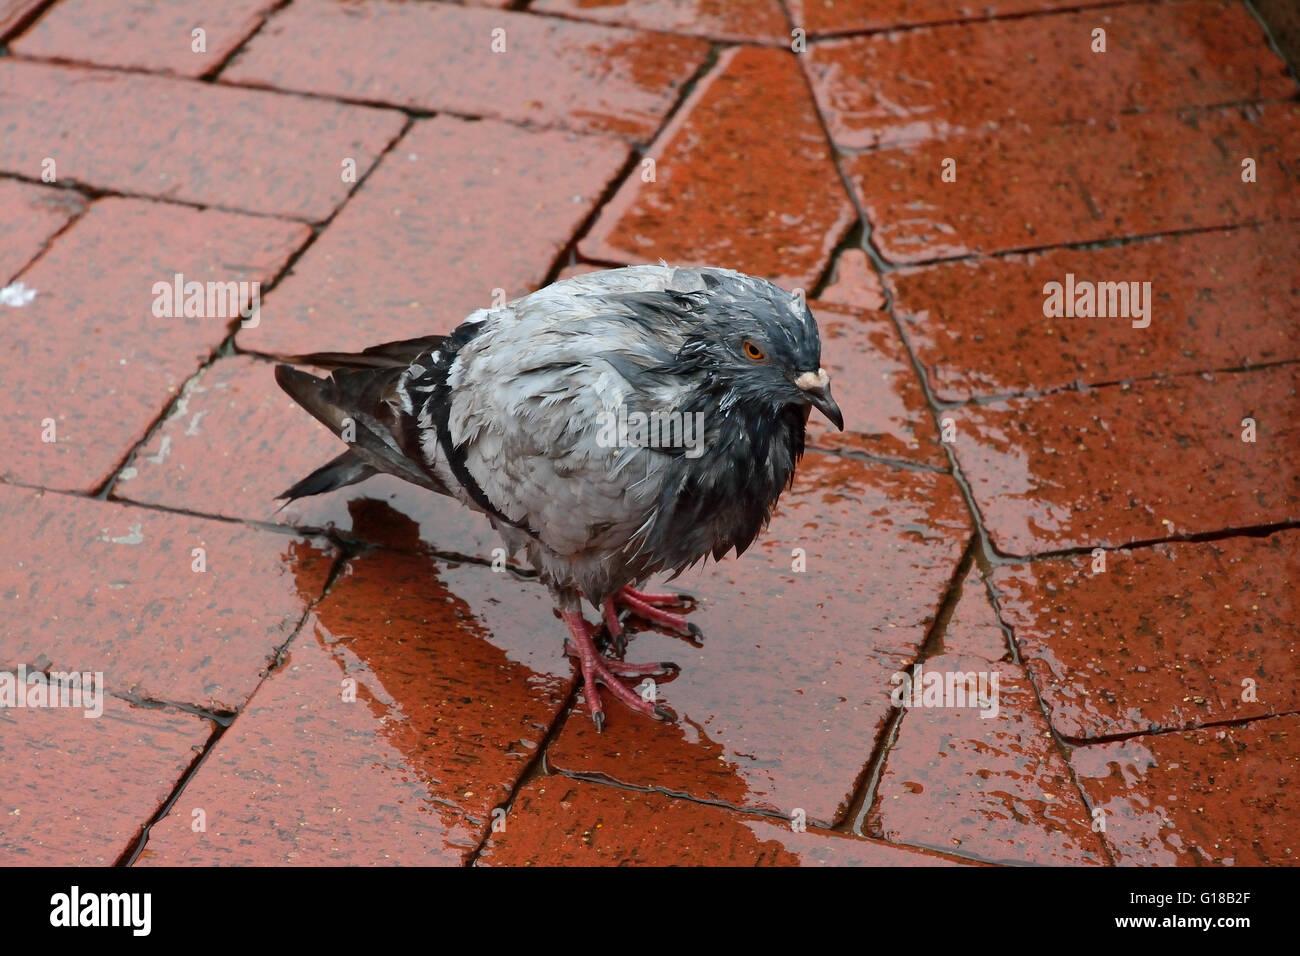 Soaking wet pigeon standing on wet block paving - Stock Image